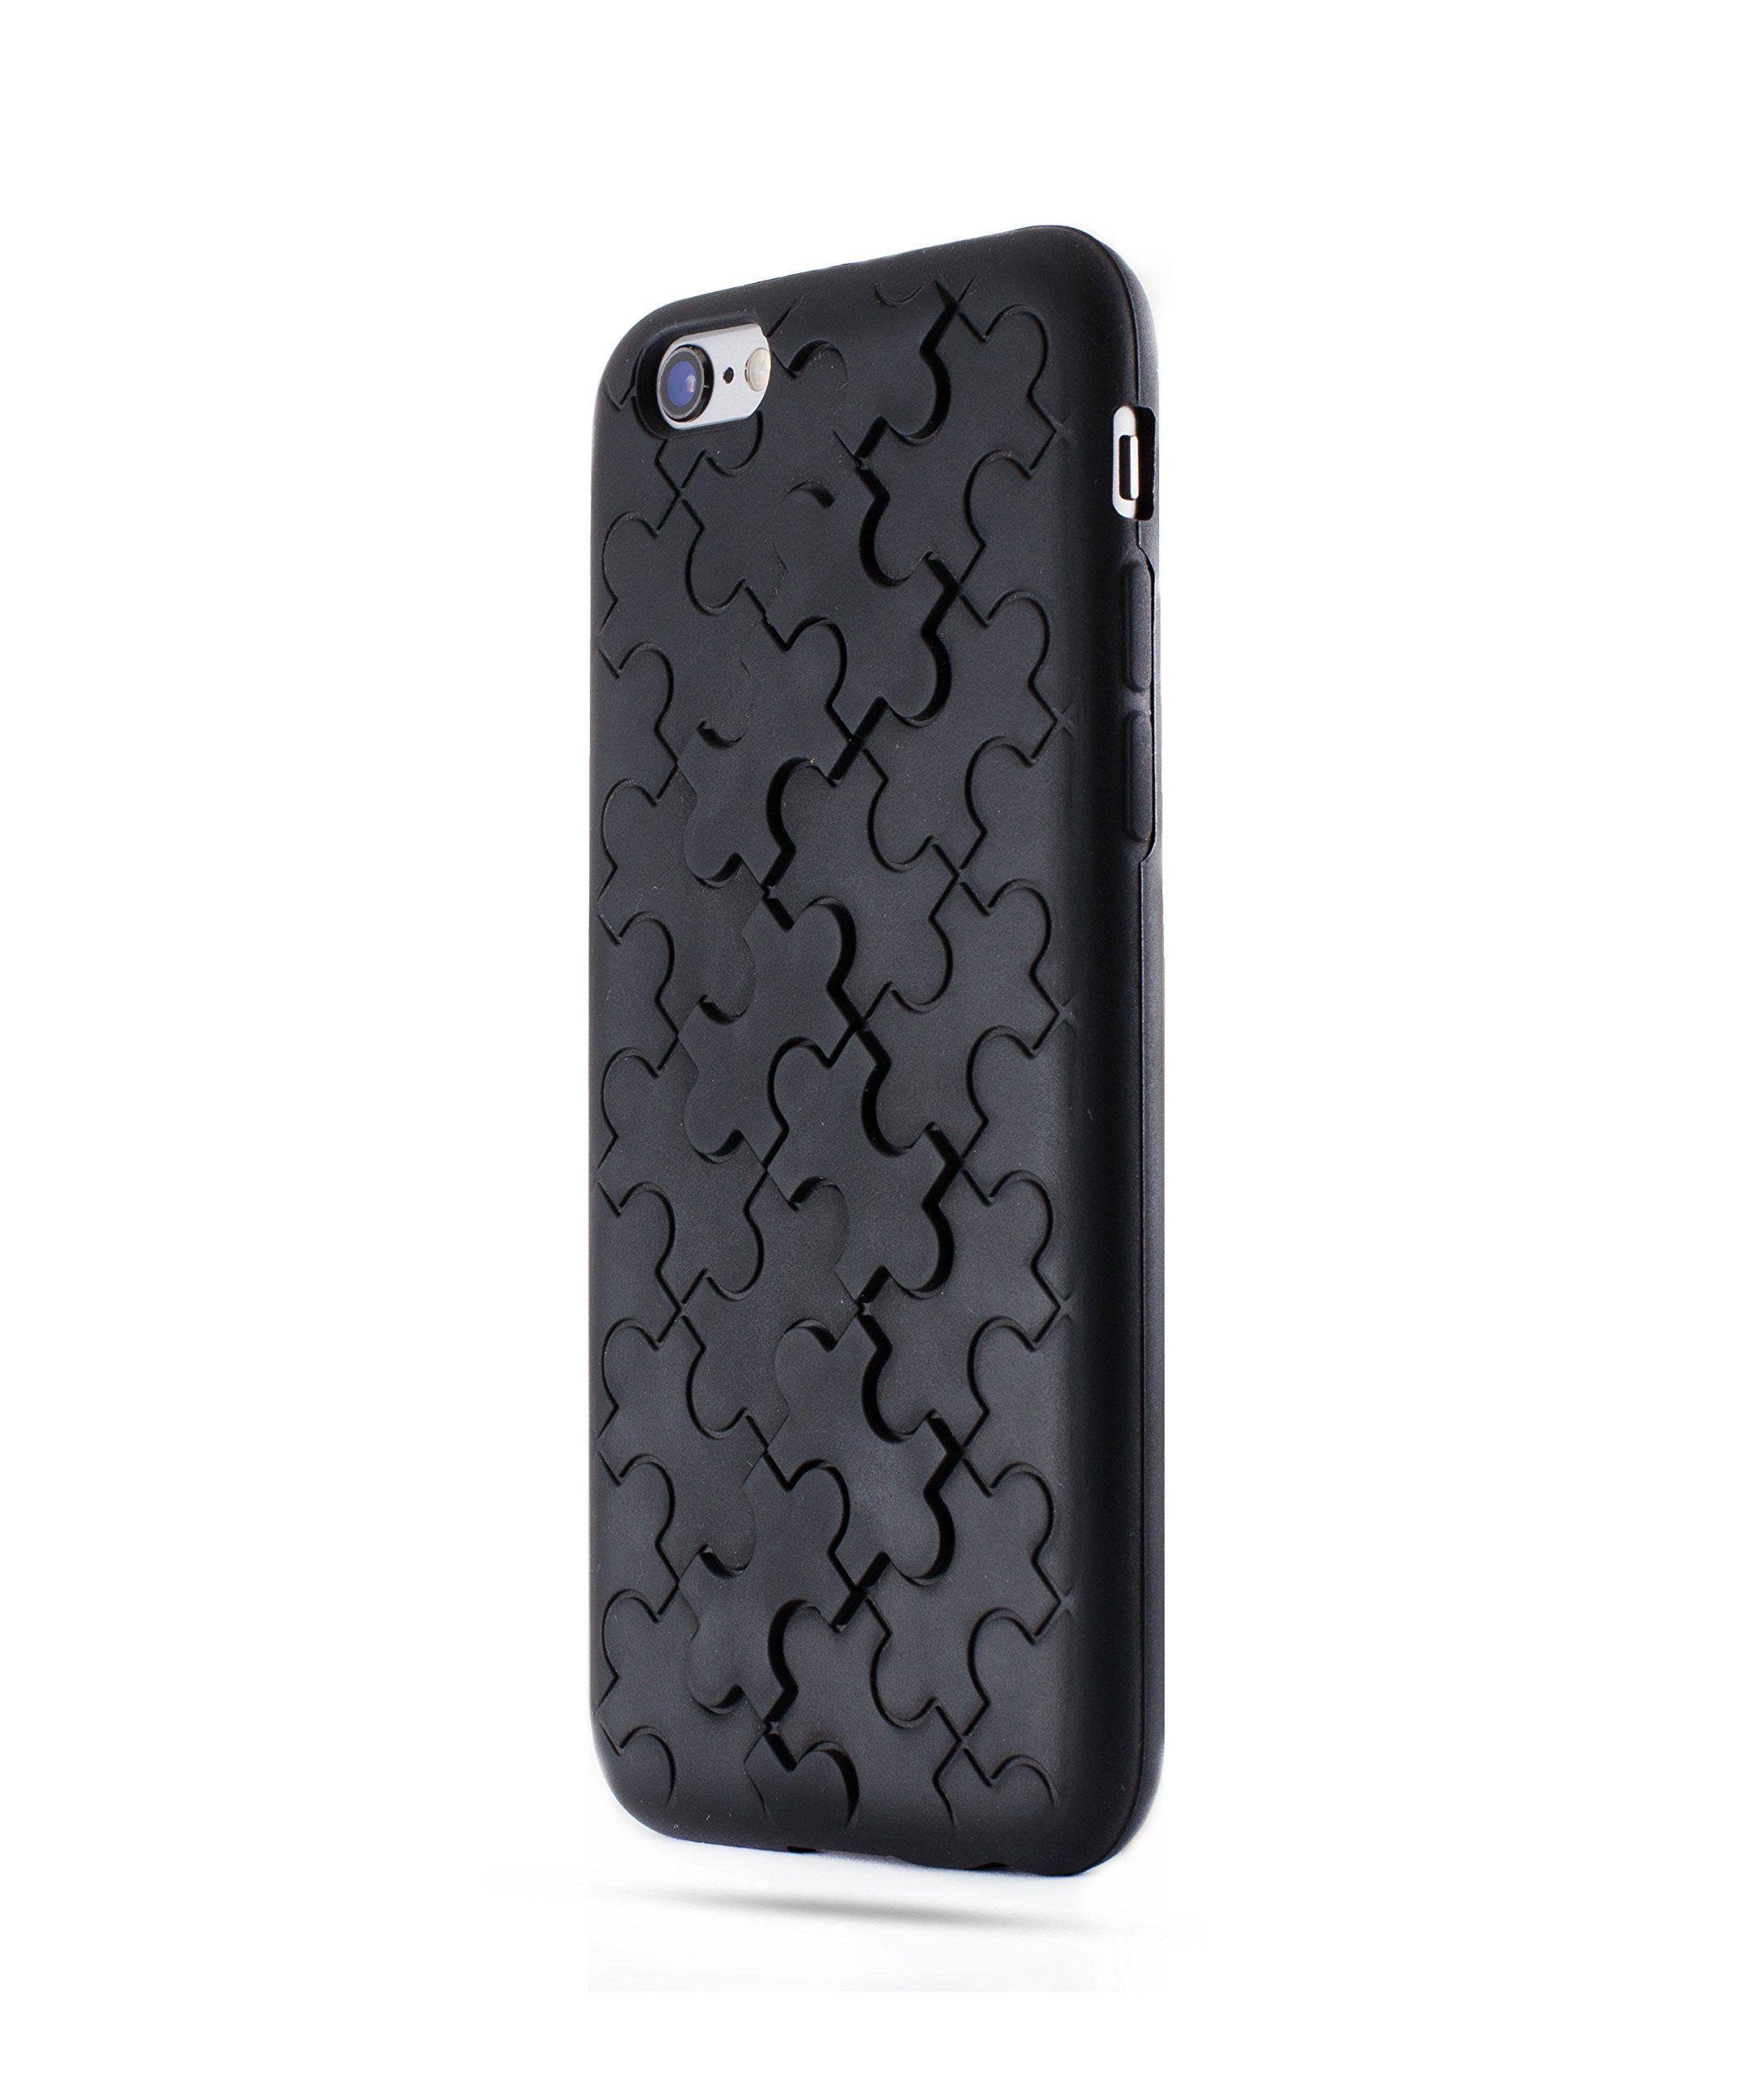 Cool 3d puzzle design stylish iphone 6 6s